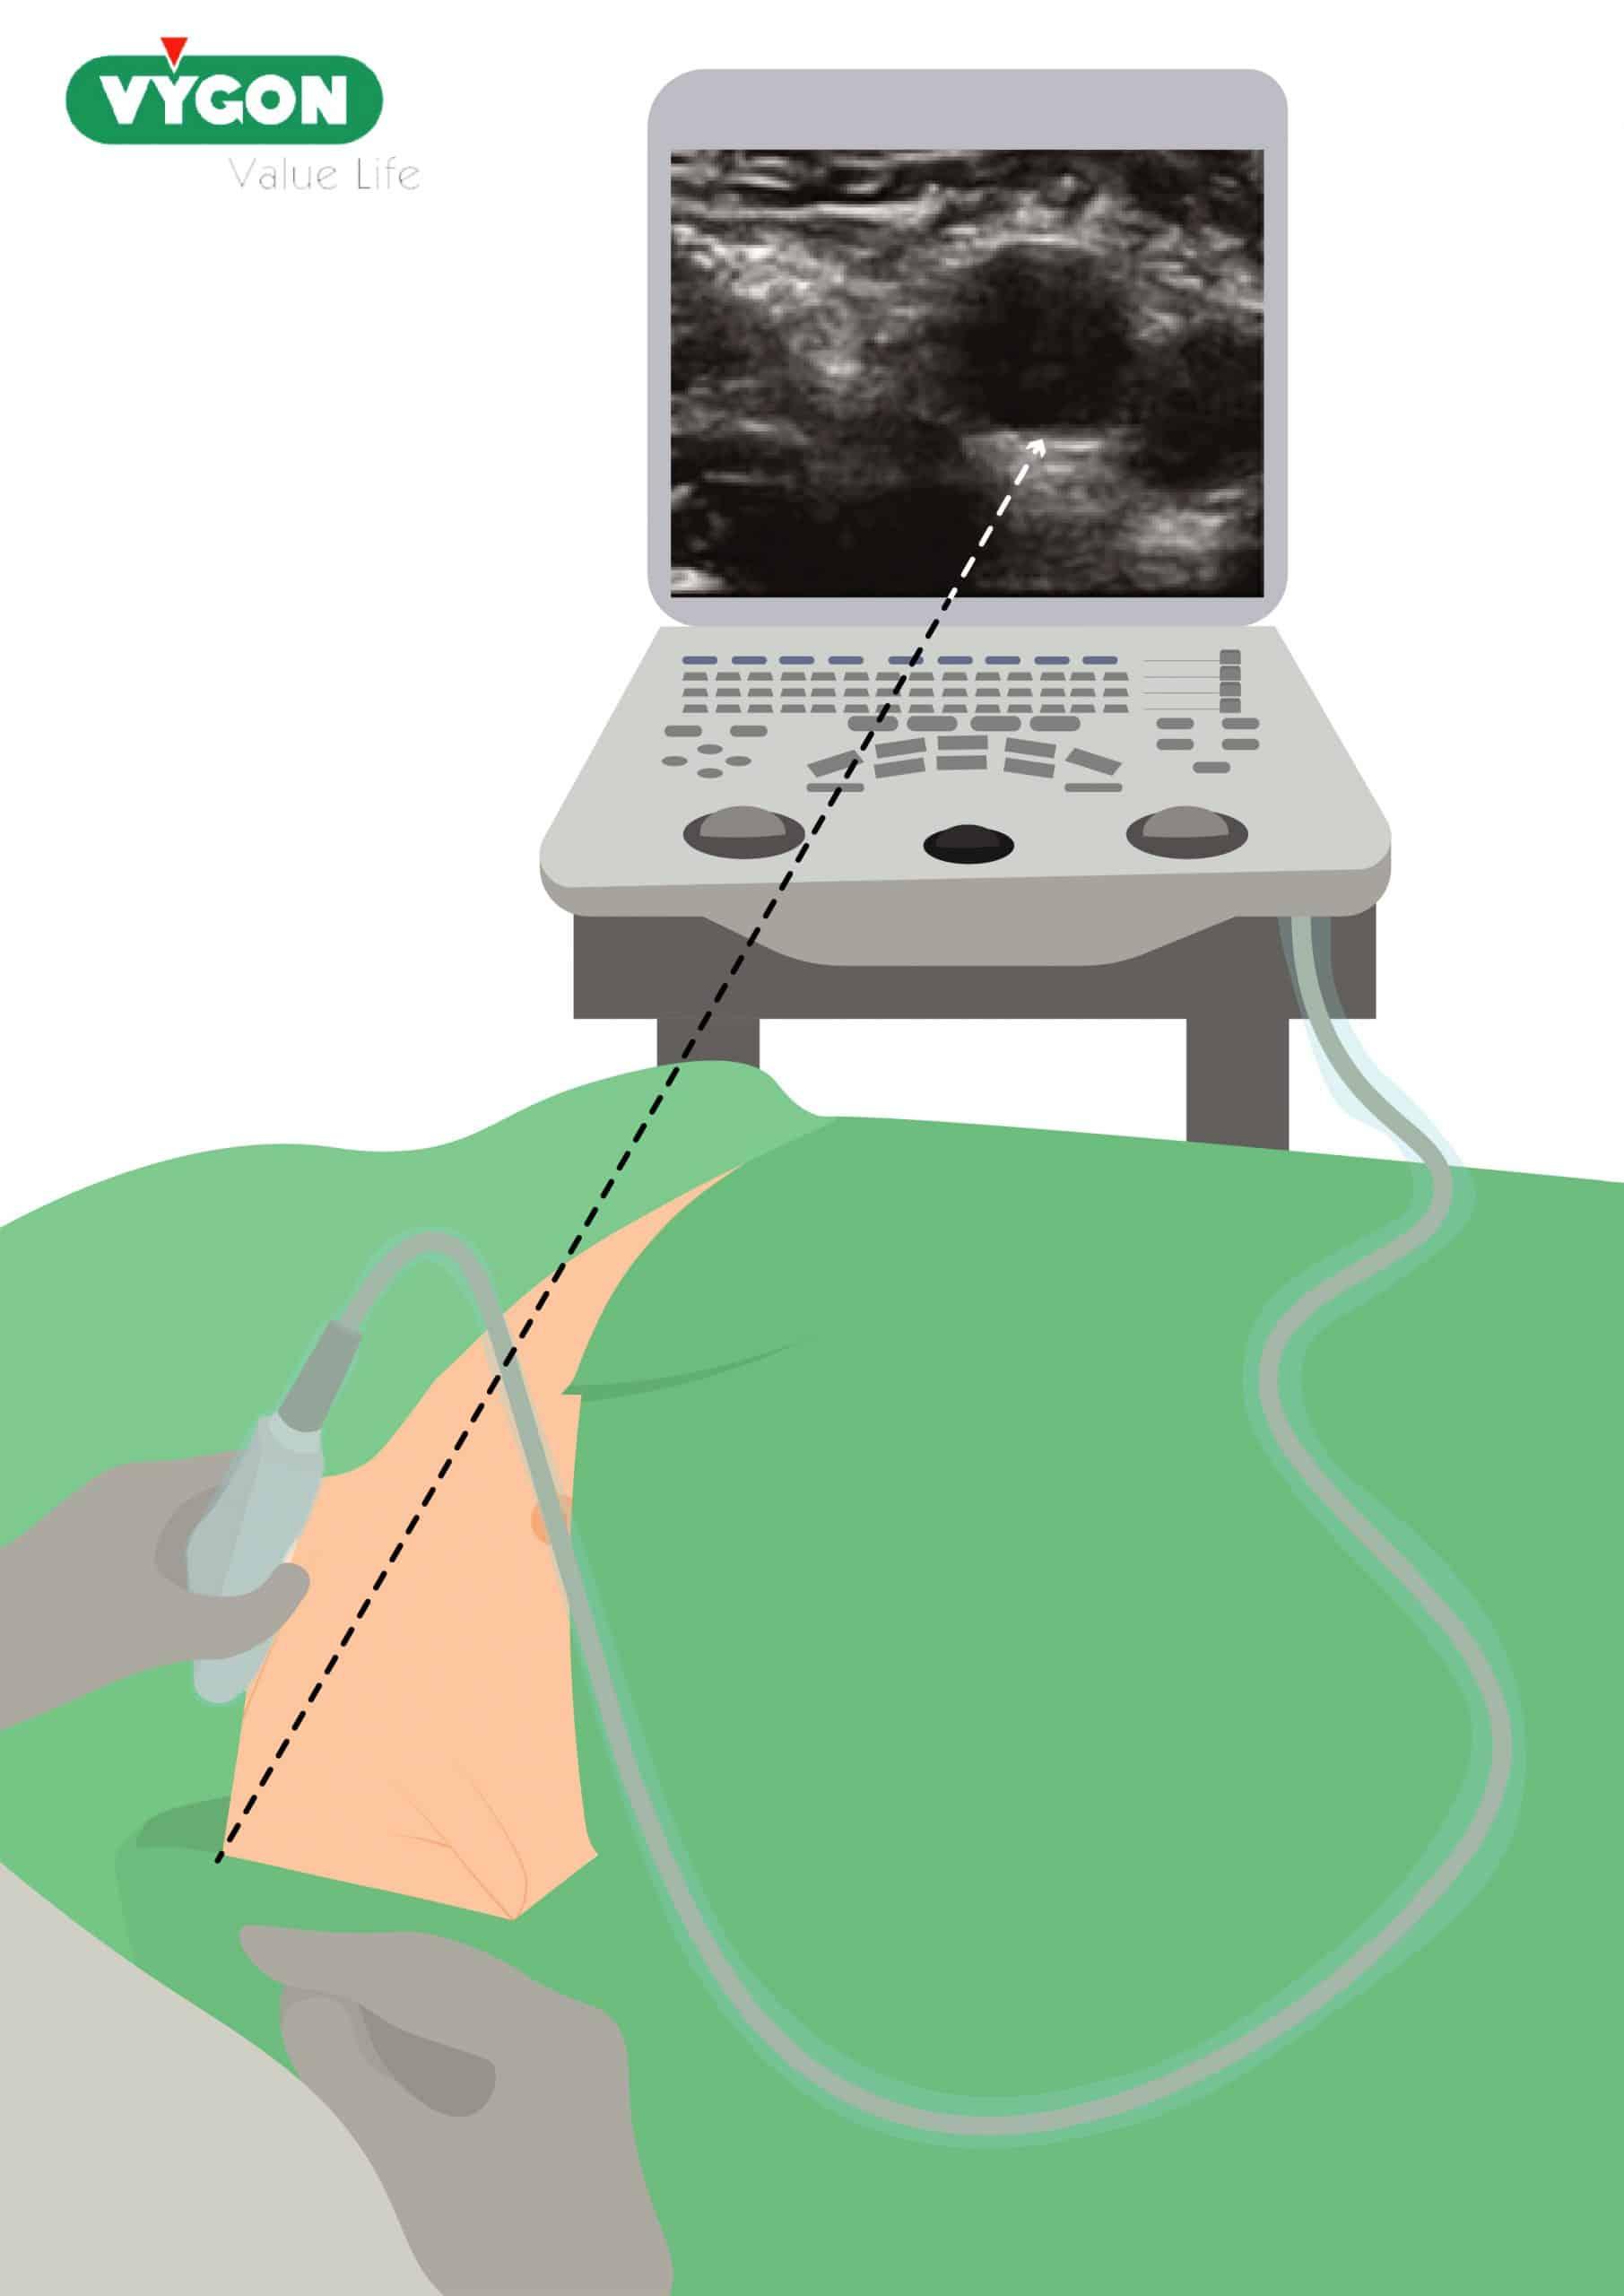 posición operador (ecografía)